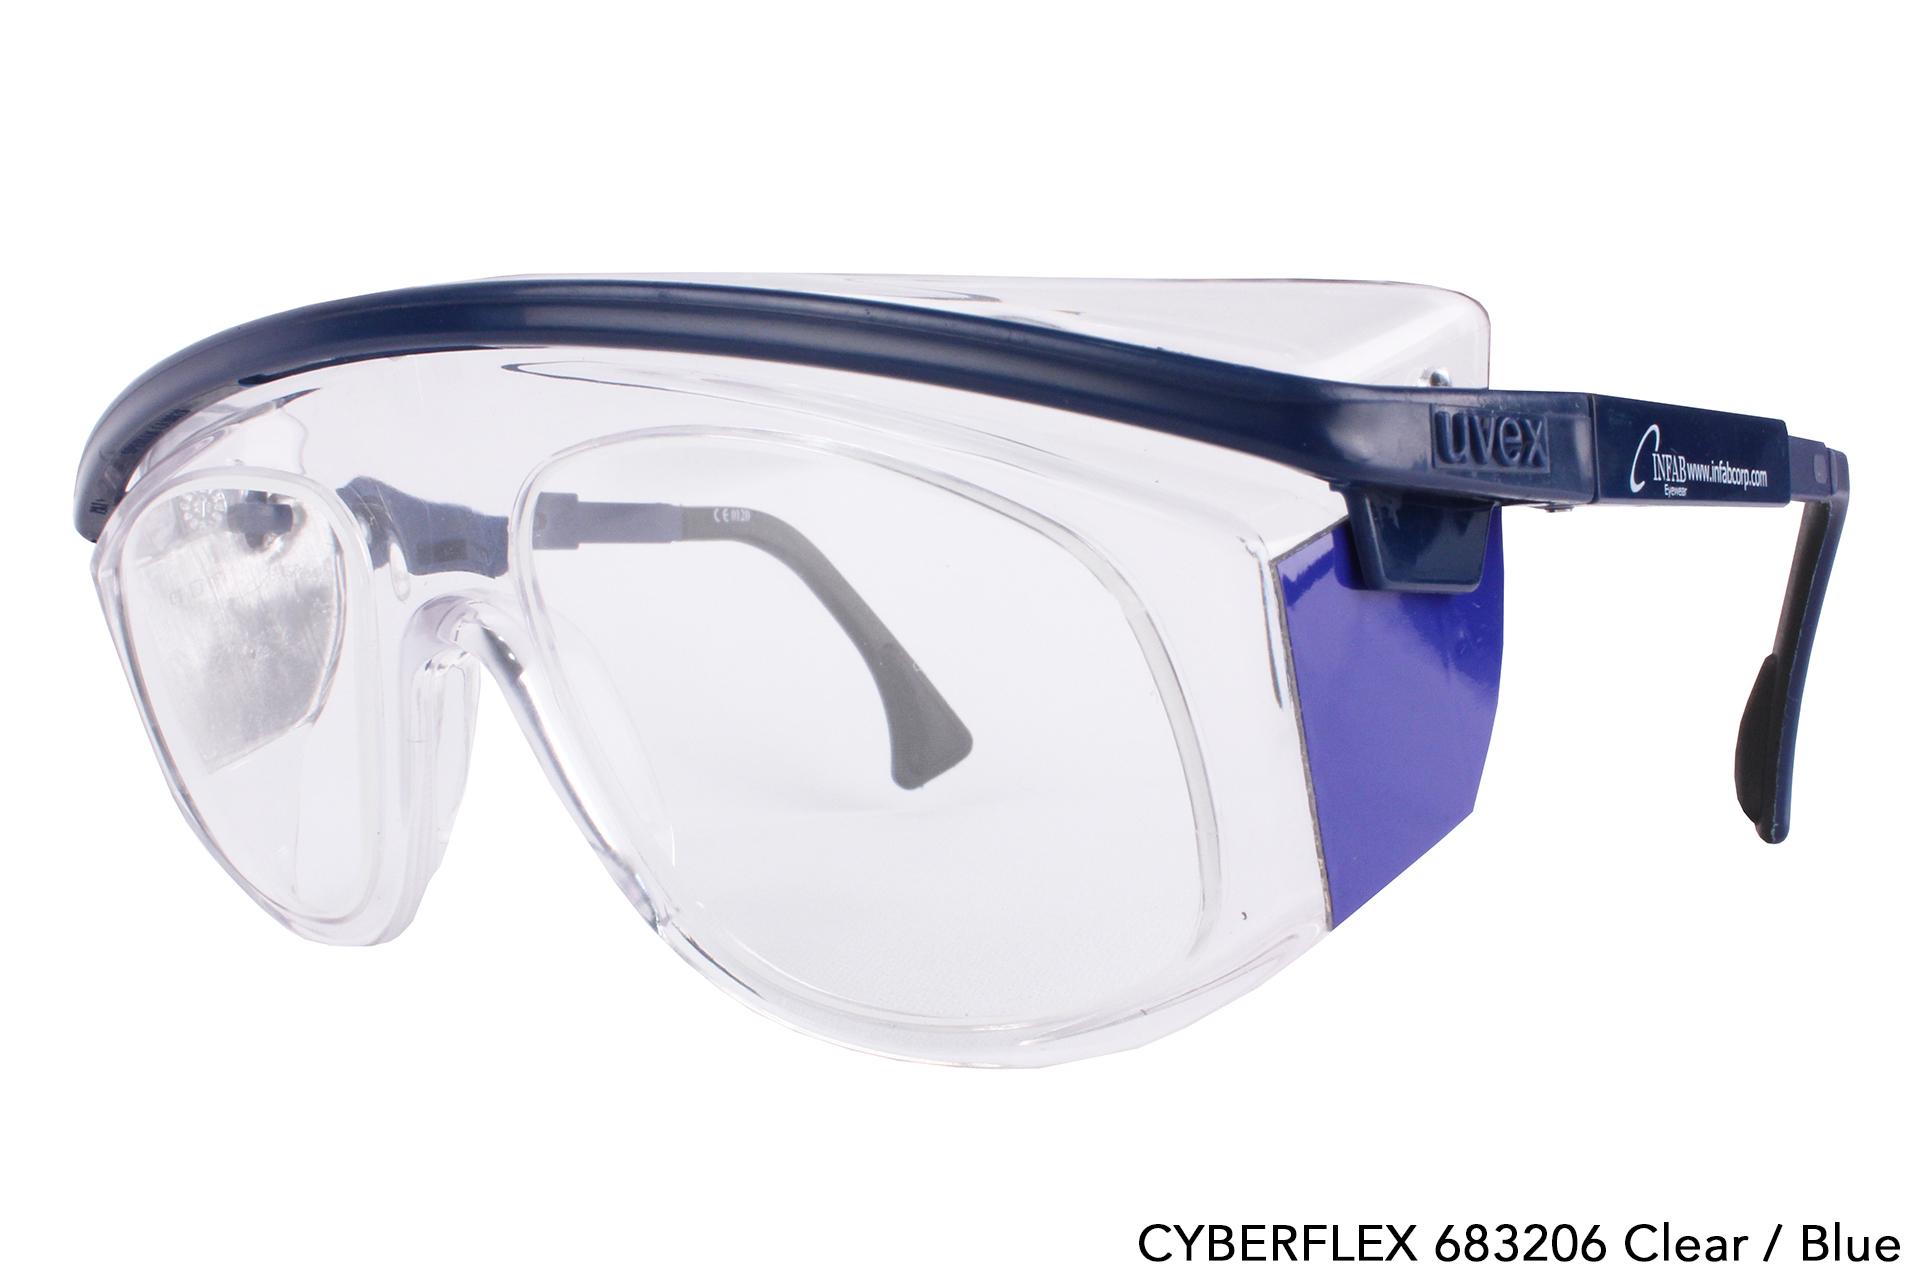 cyberflex-683206